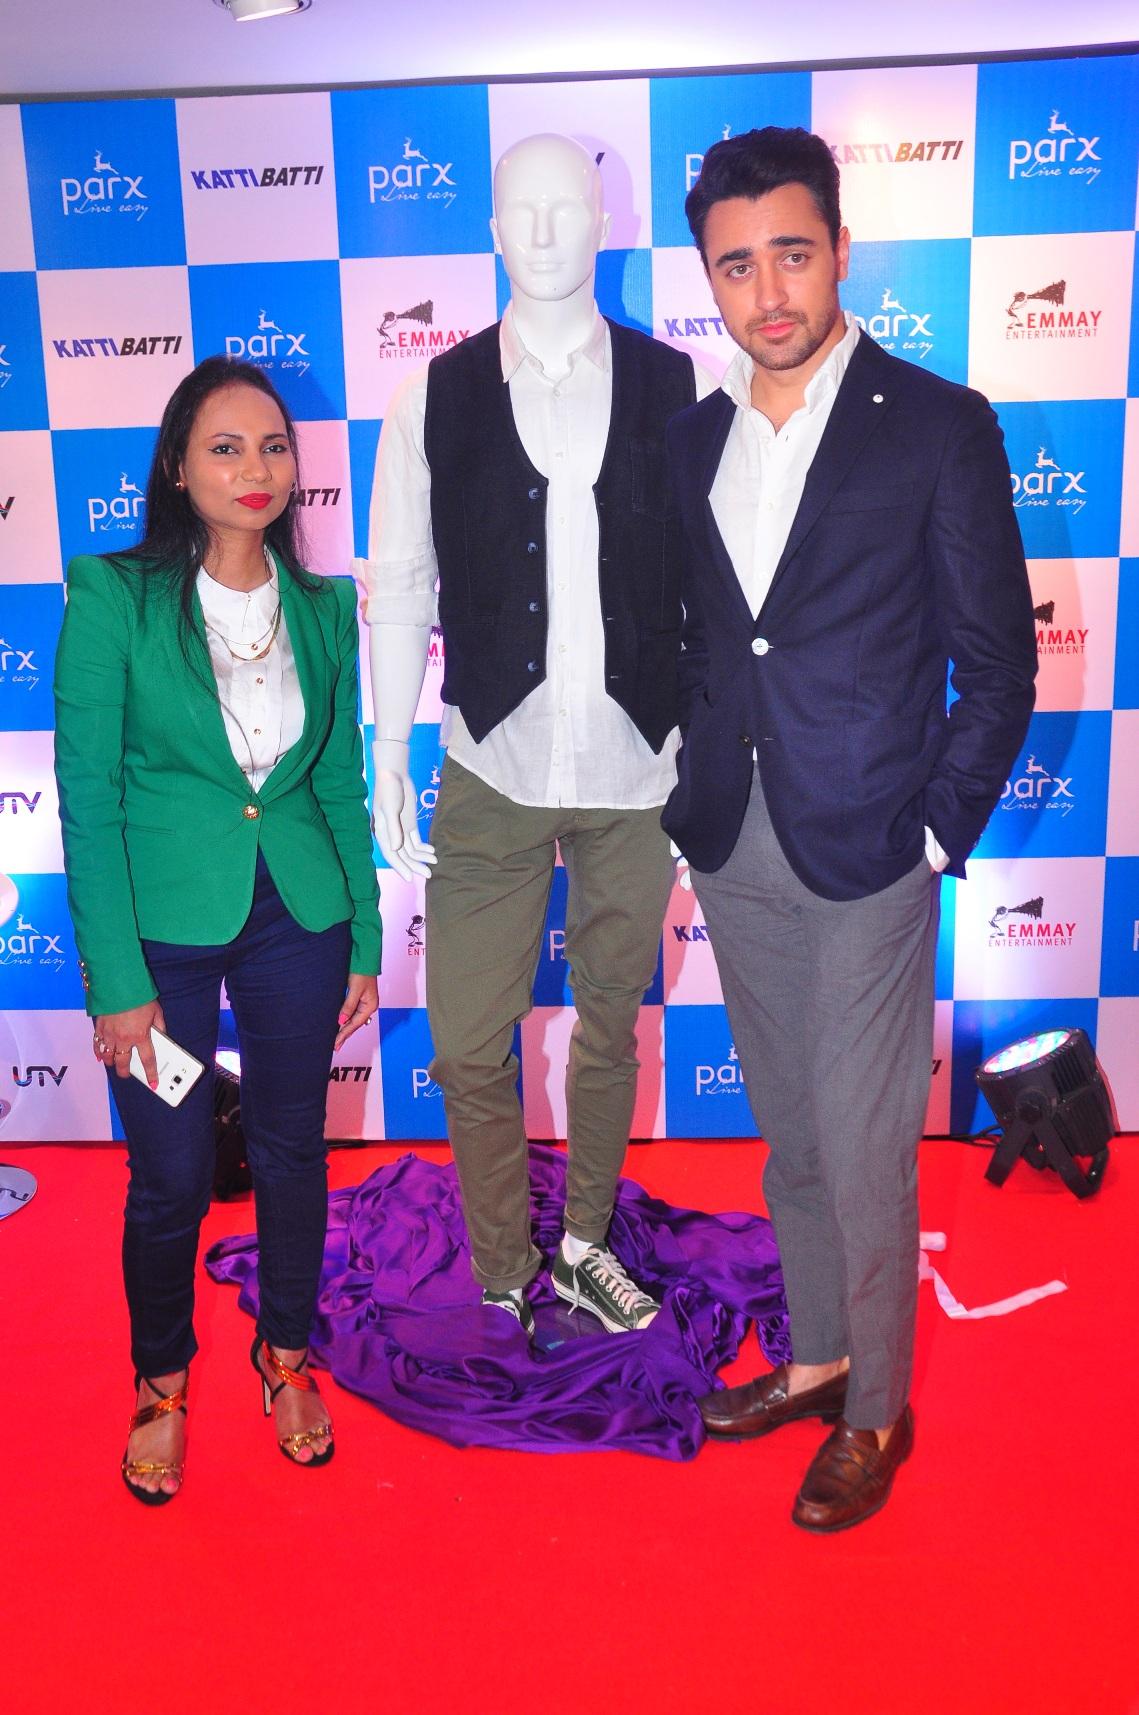 Imran Khan and Nikhil Advani launched 'Katti Batti' Collection